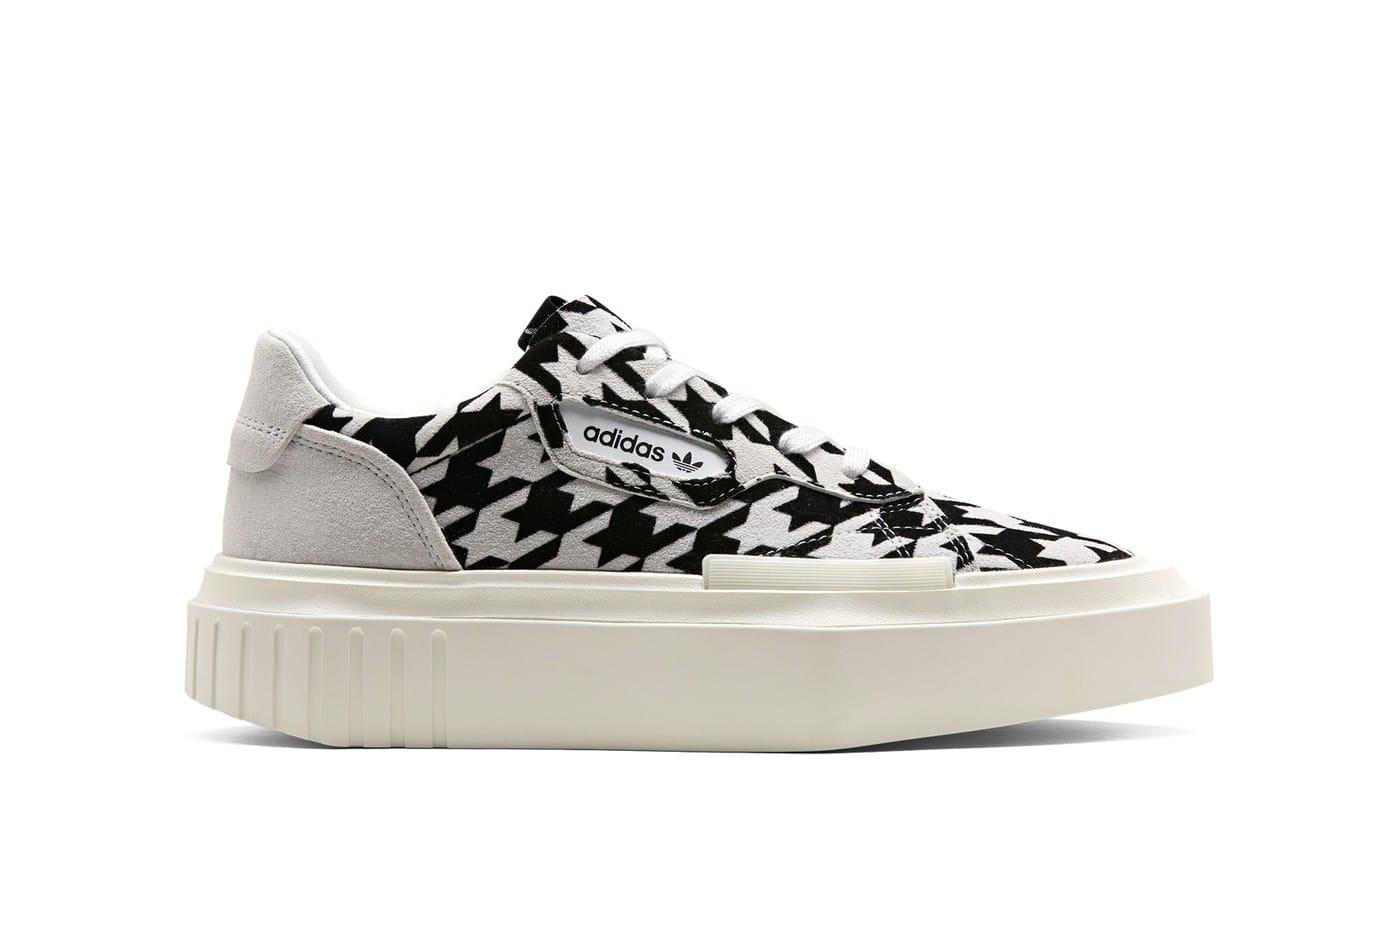 rihanna adidas shoes